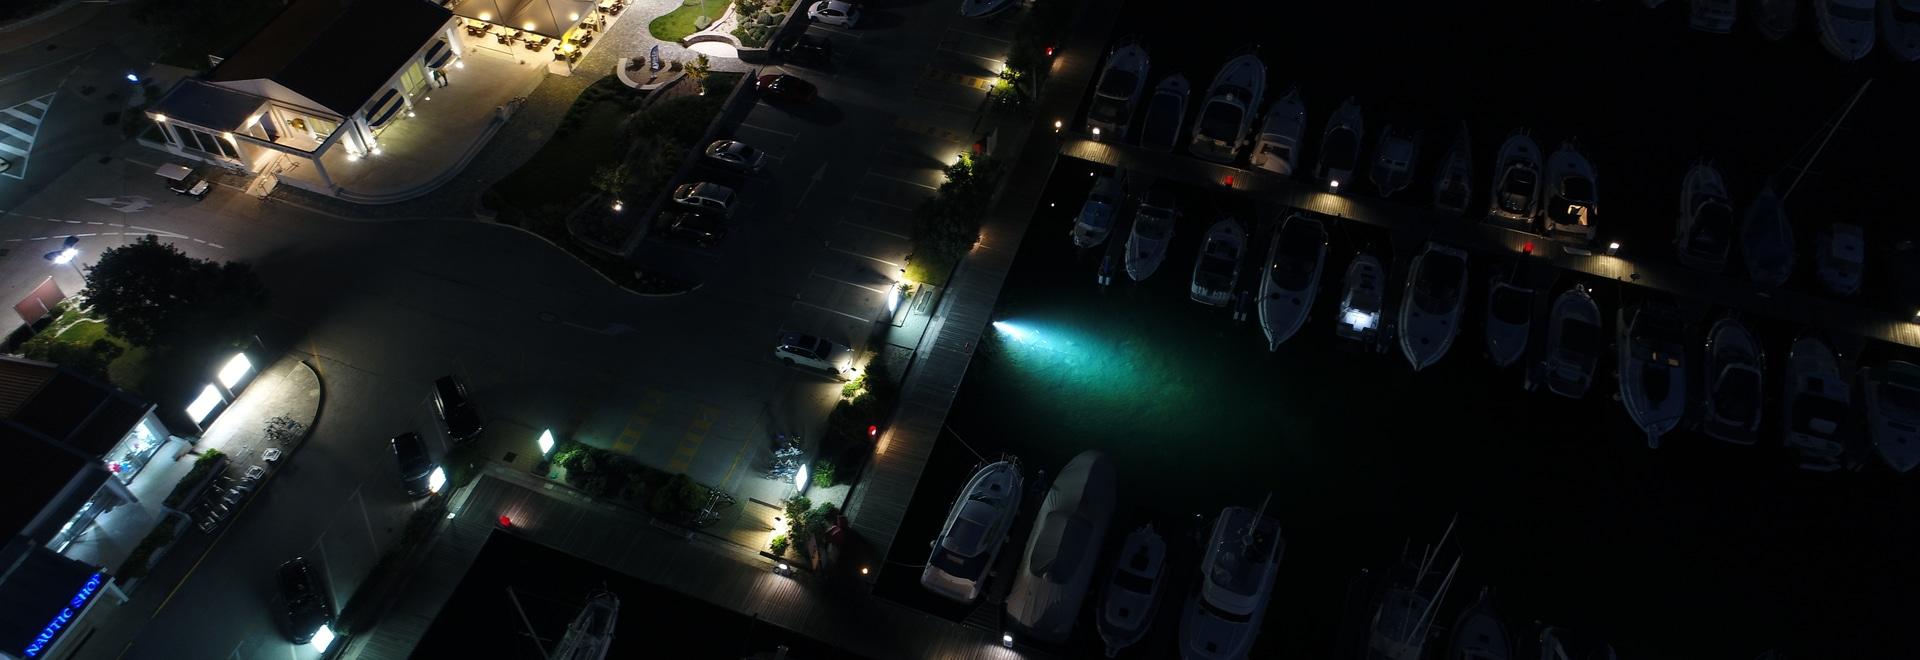 Underwater LED Light CONVEX